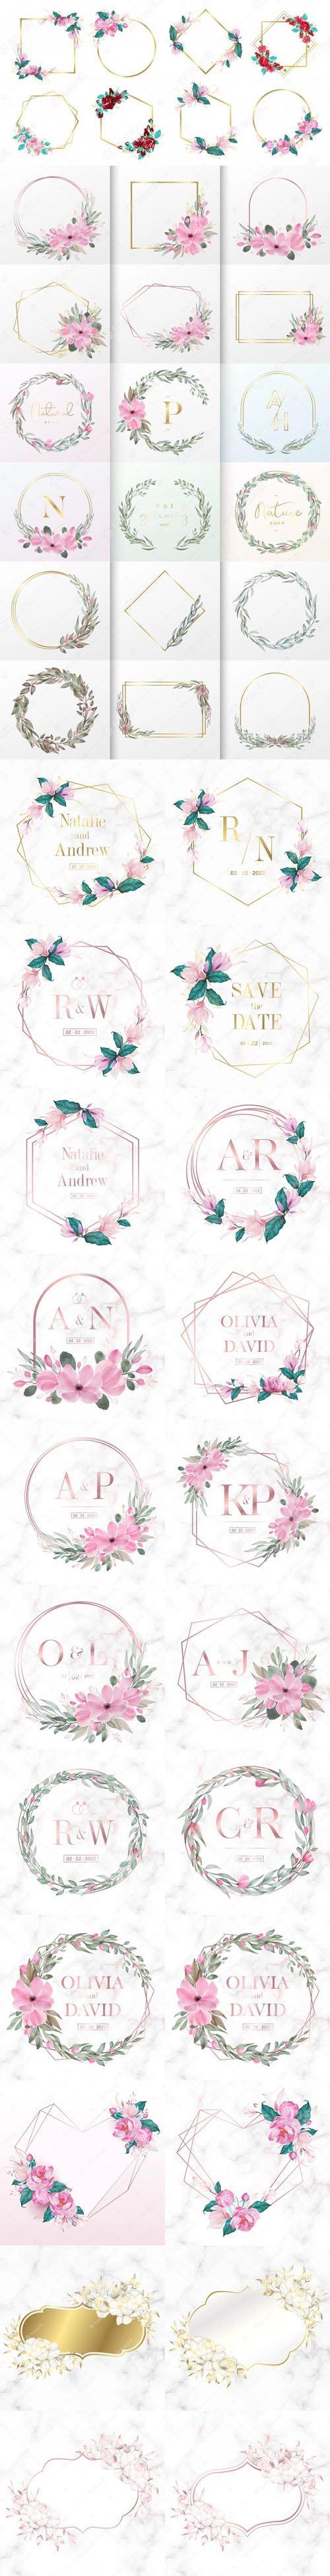 Watercolor Floral Frames for Wedding Monogram Vector Collection - 25 EPS